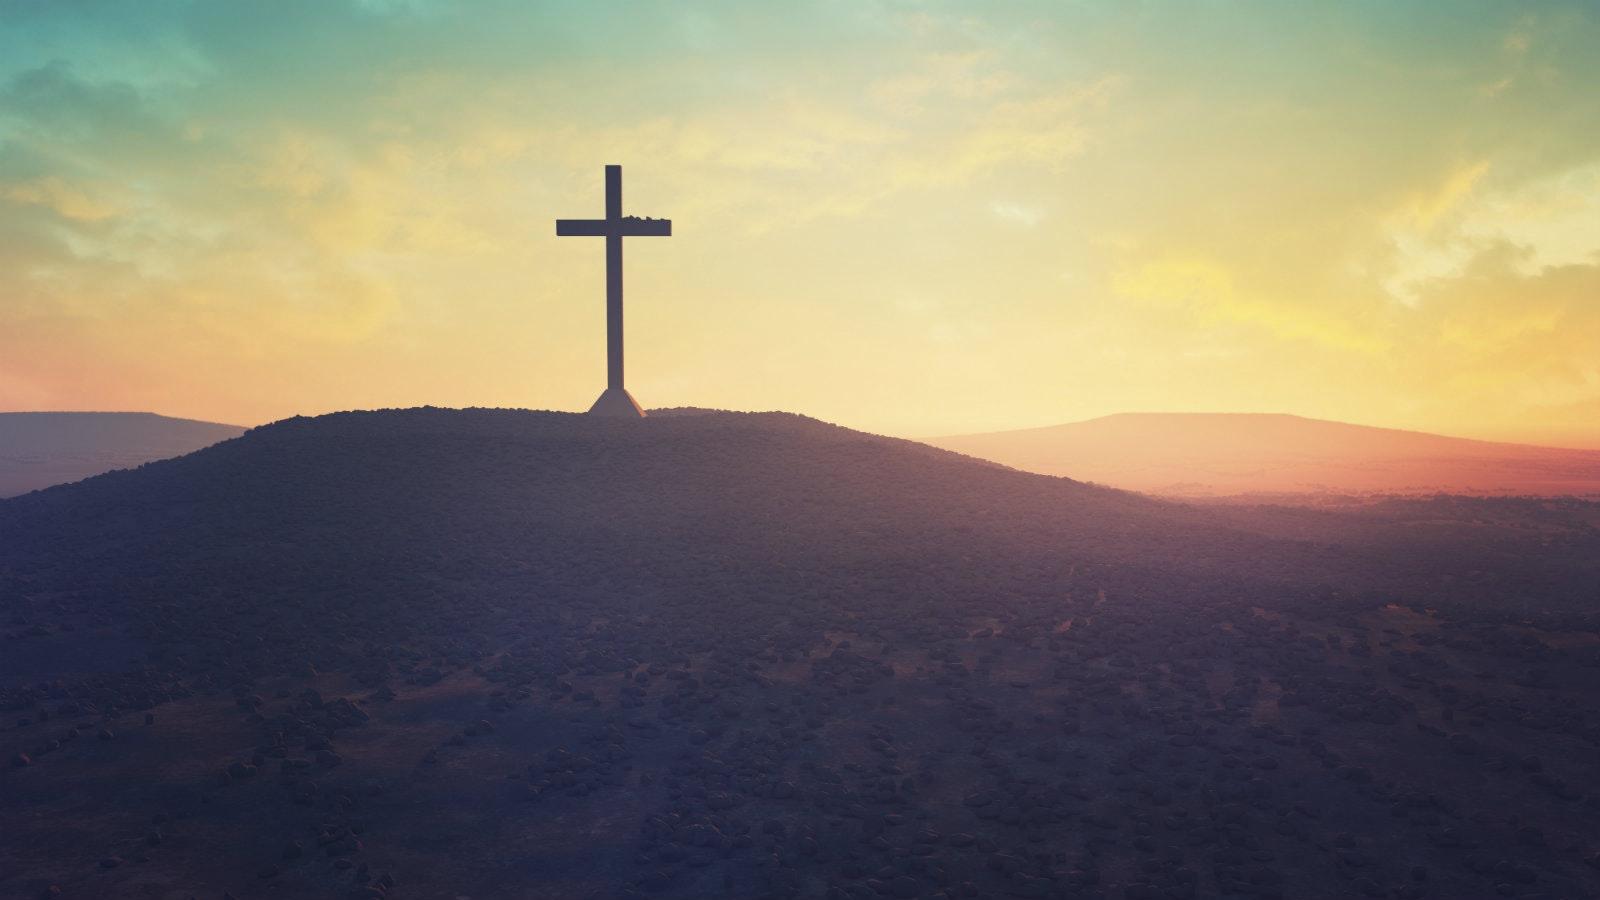 jesus paid it all desiring god